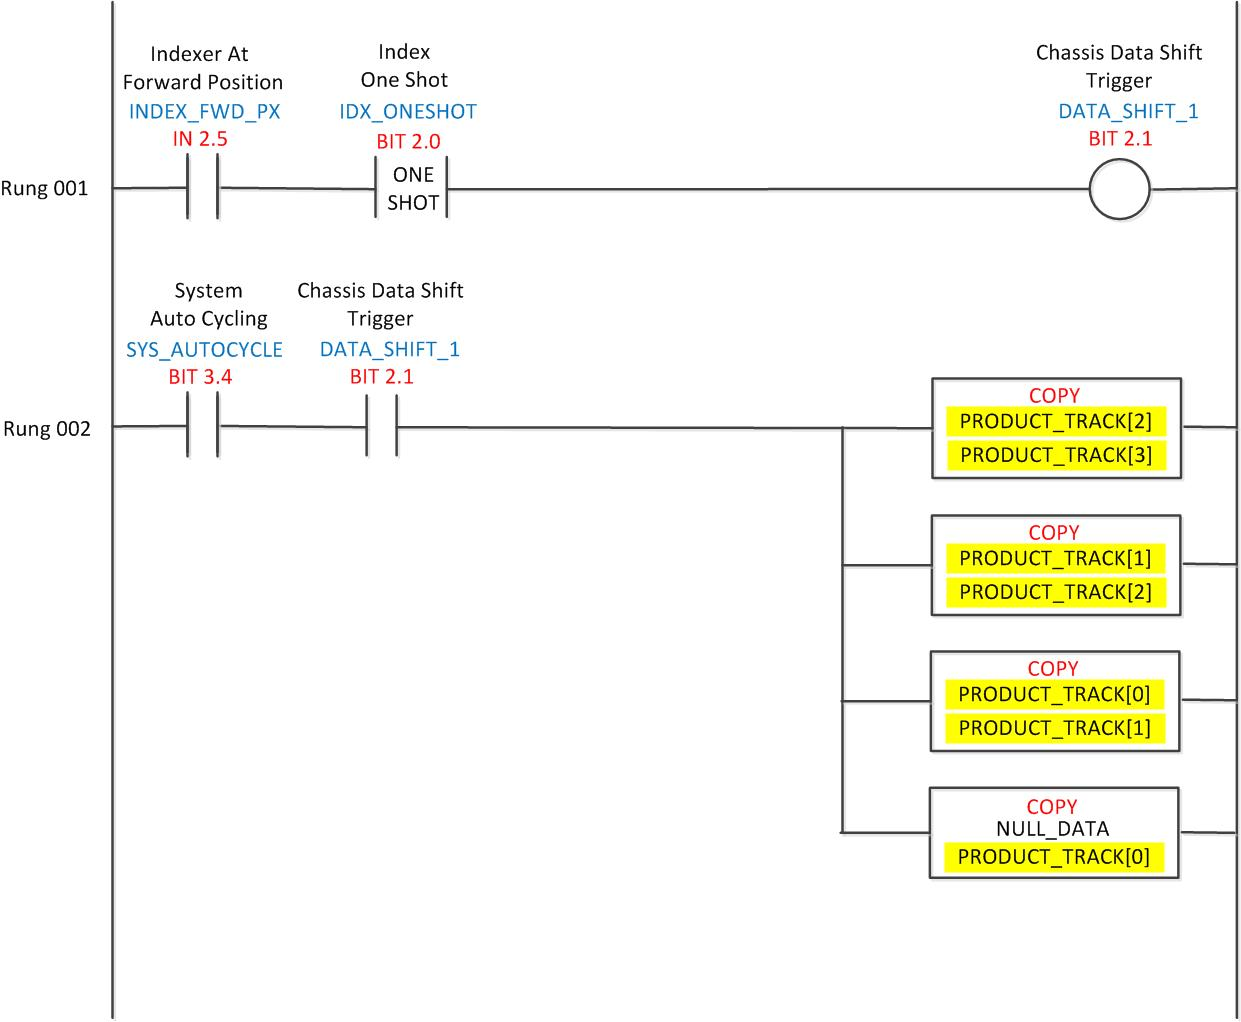 ladder wire diagram plc wiring diagram symbols pdf jacob's ladder wiring diagram plc wiring diagram symbols pdf